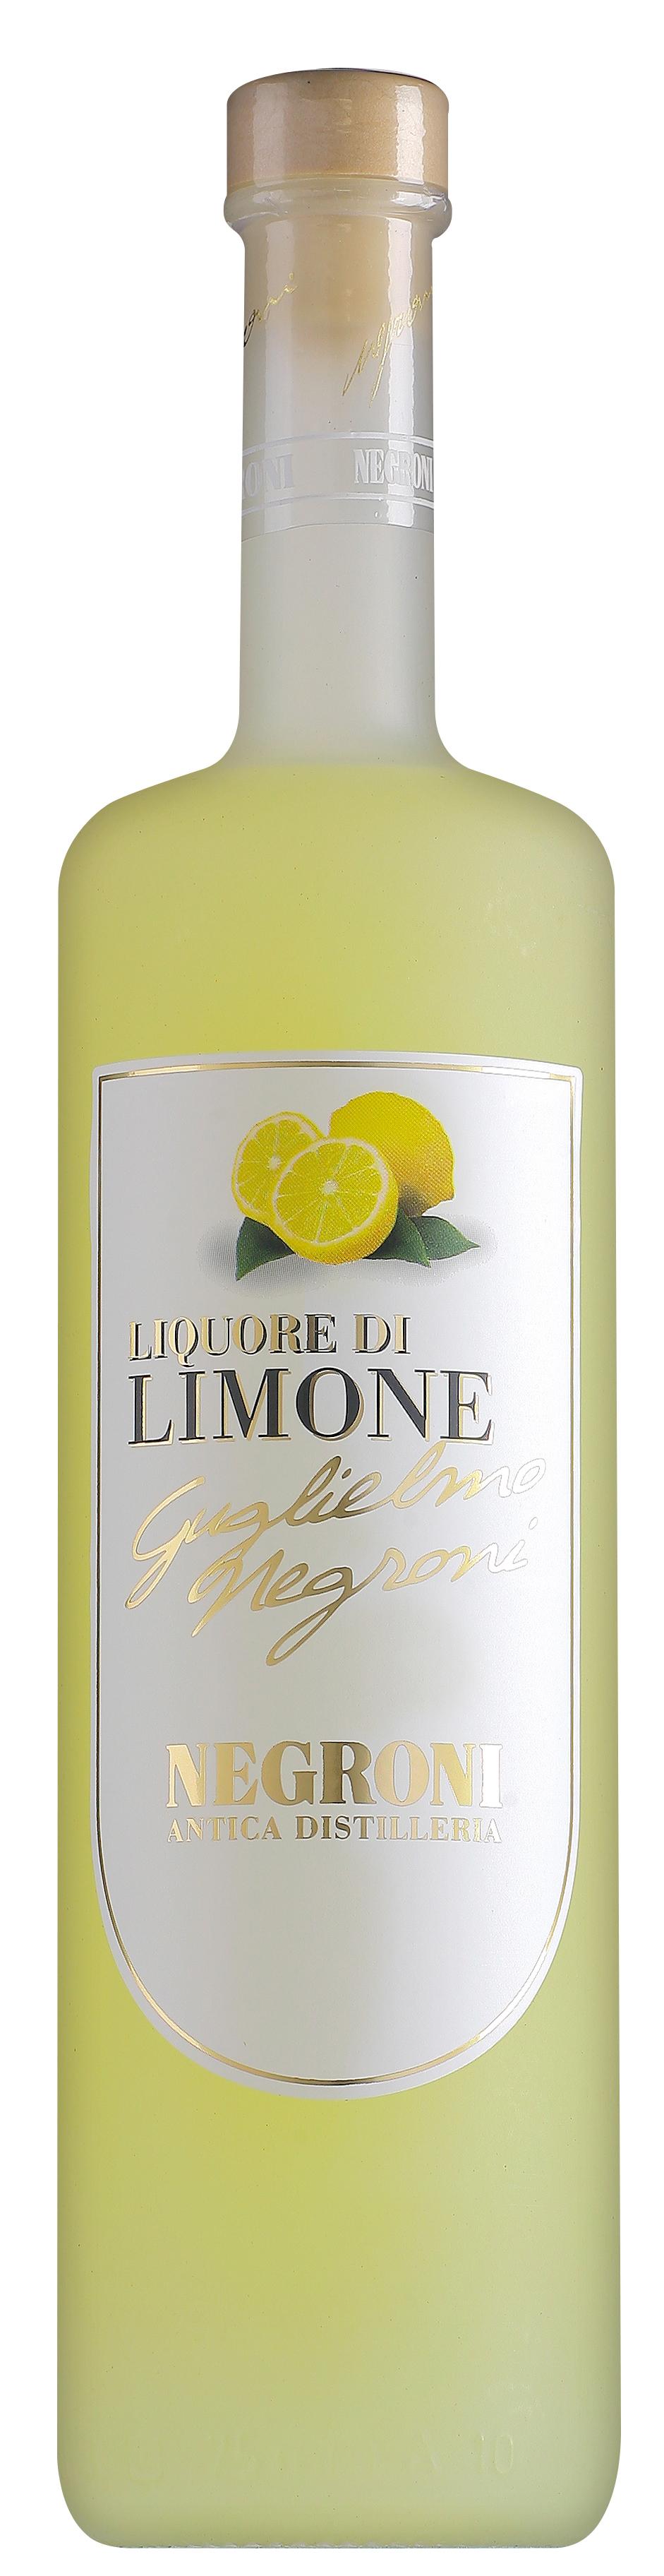 Negroni Limoncino 70cl